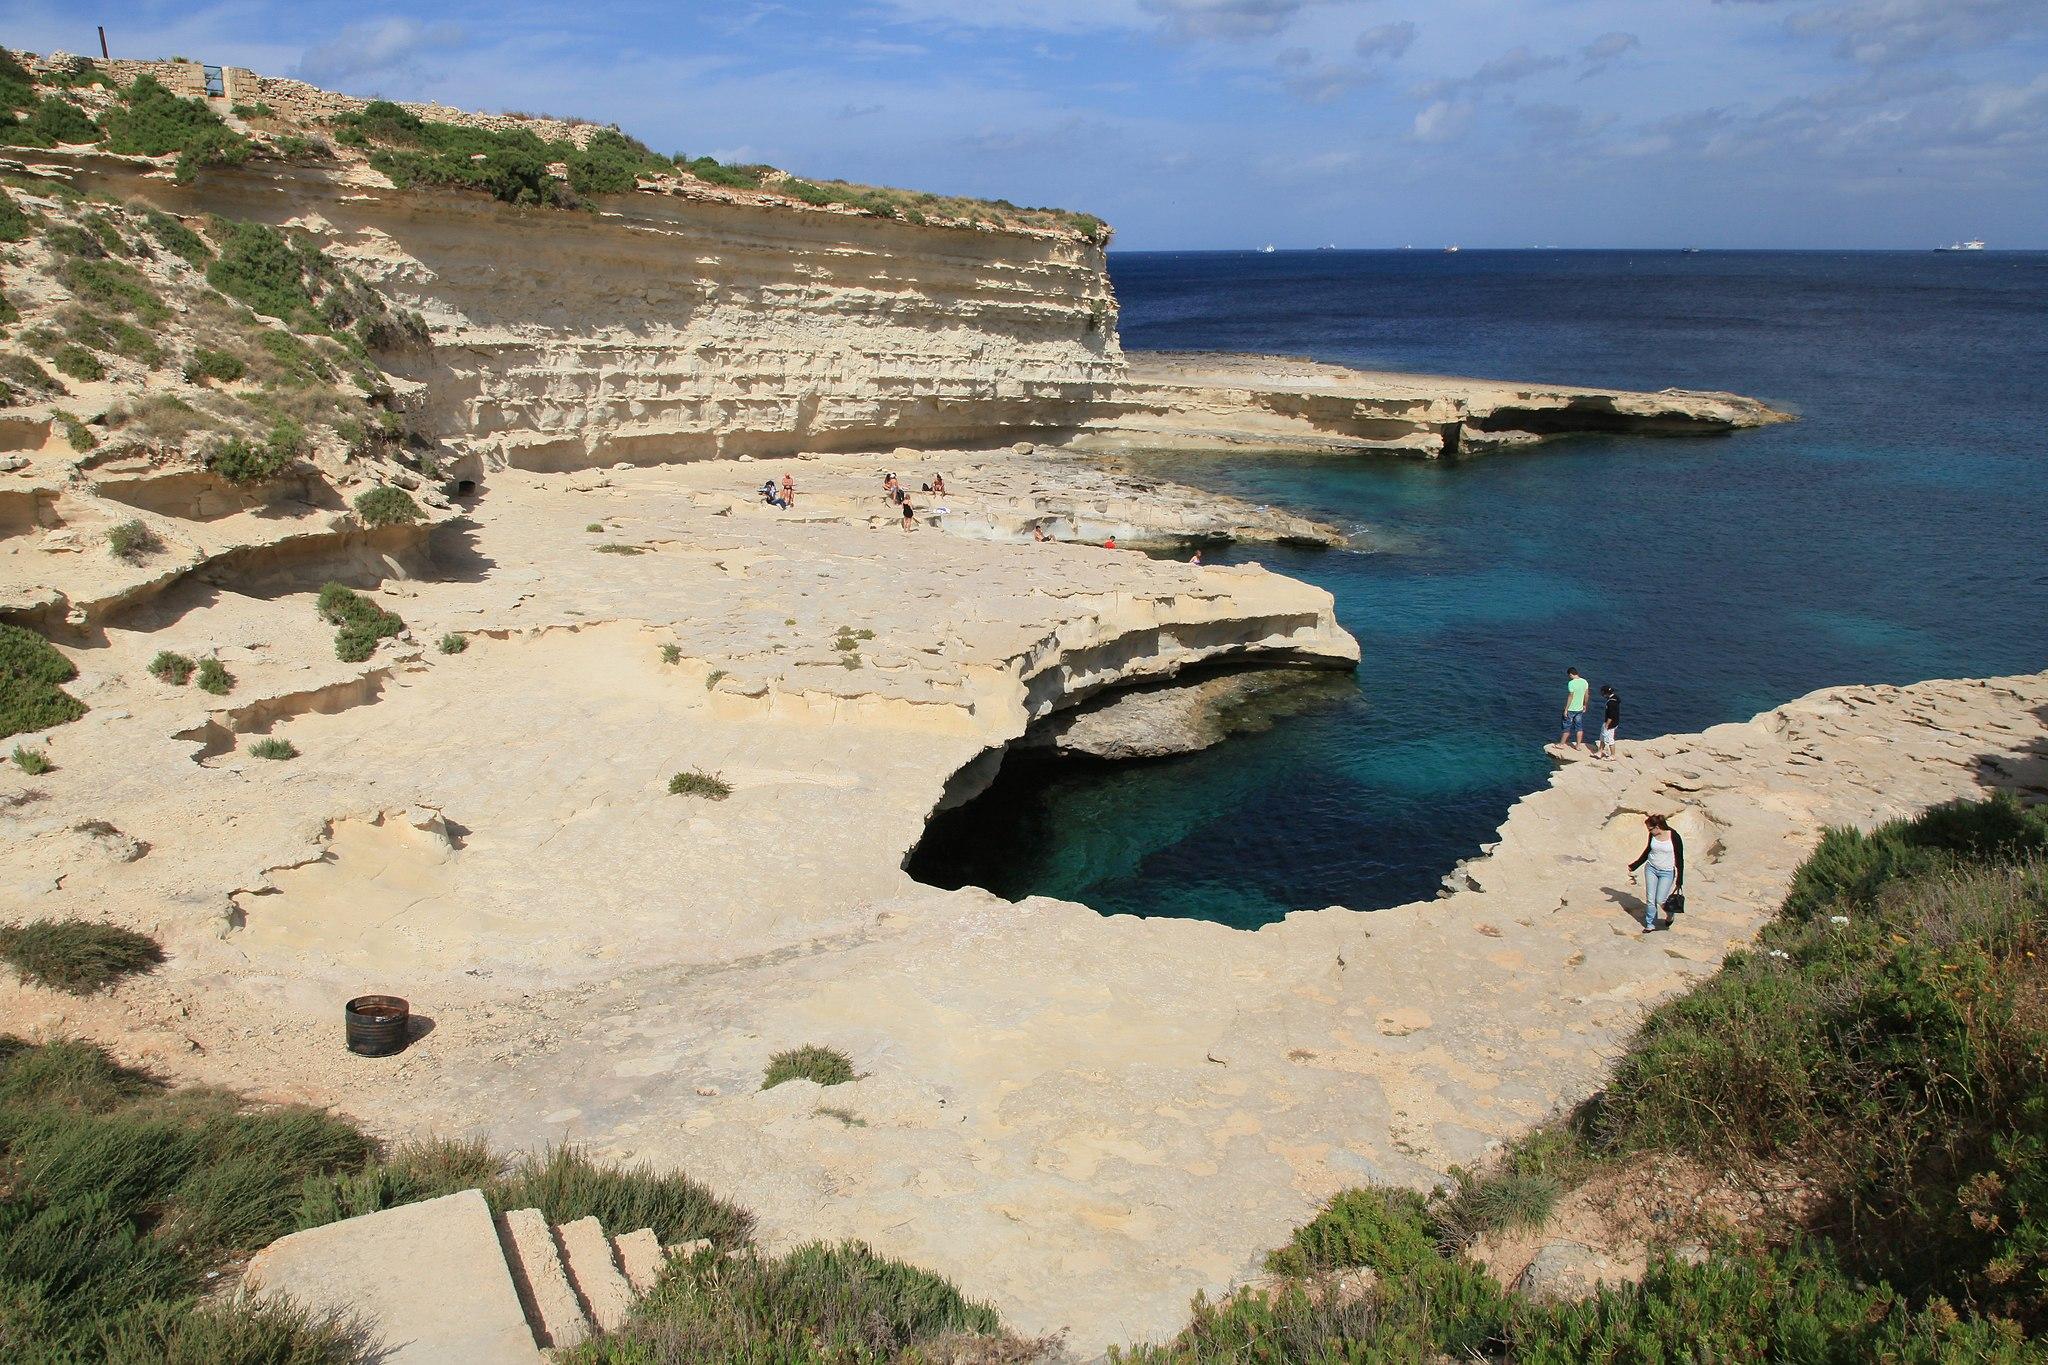 Pools in Malta